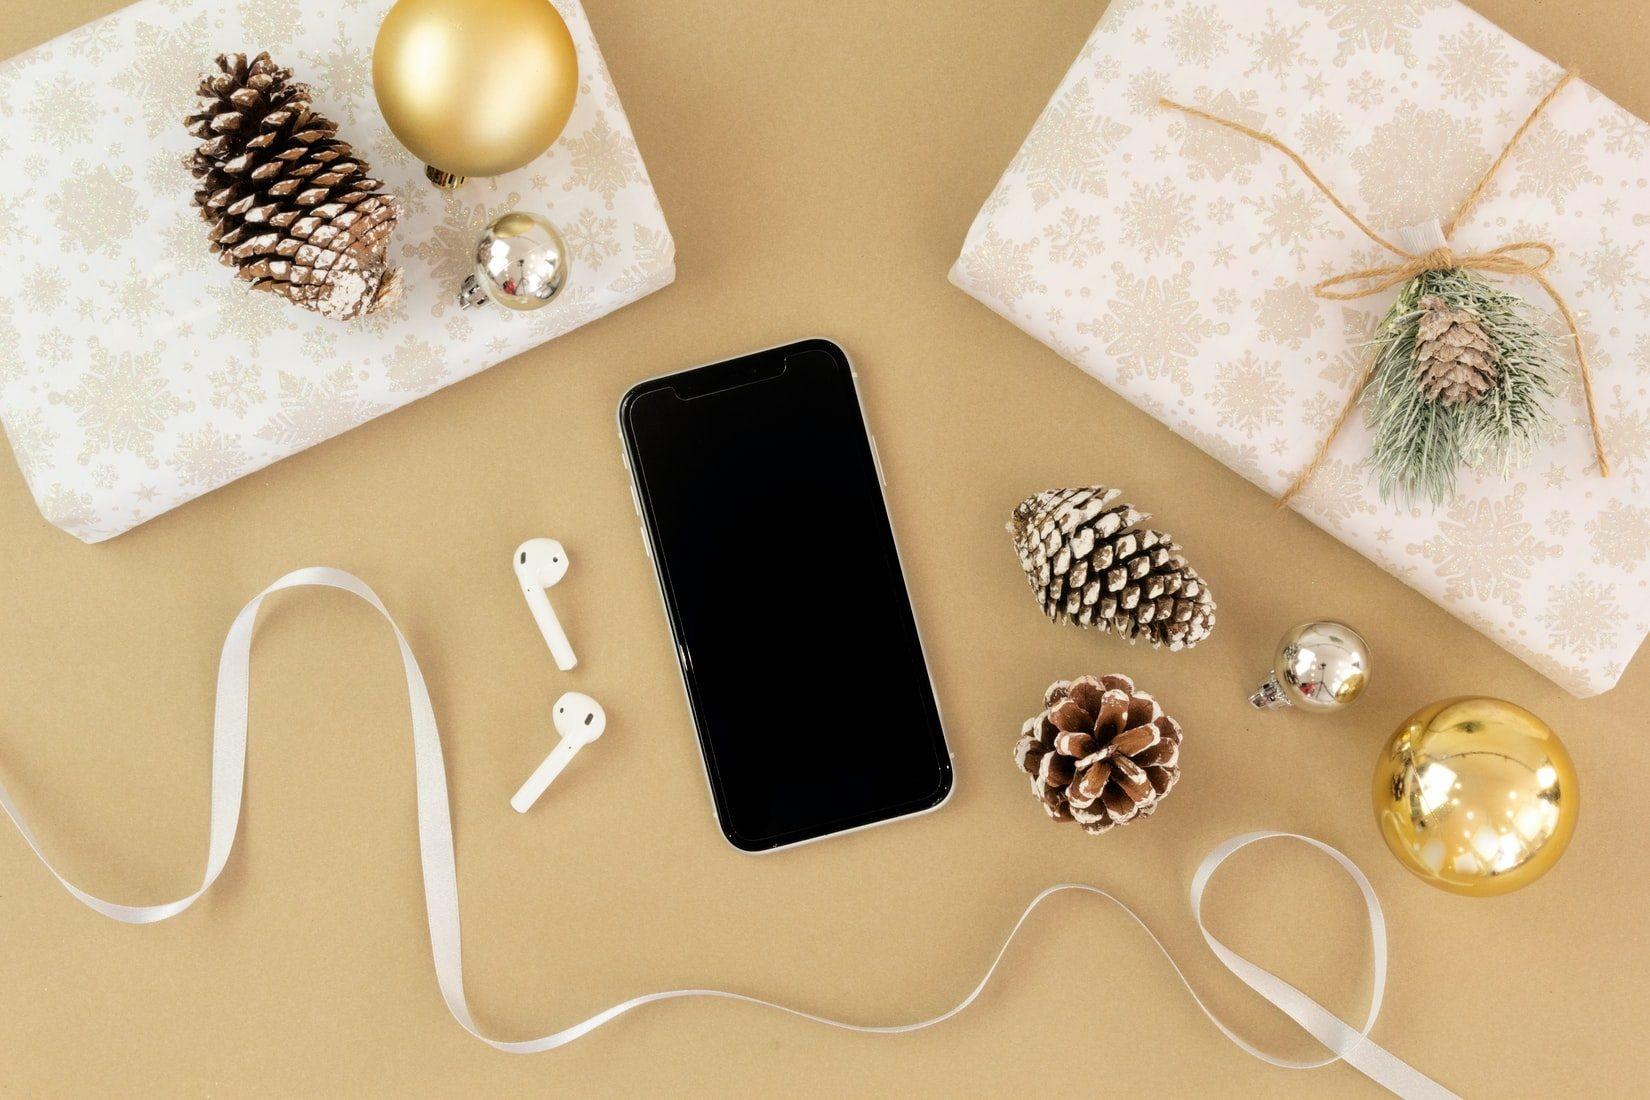 Pin By Allwanz On منوعات Ebay Gift Christmas Tree Inspo Rose Gold Apple Watch